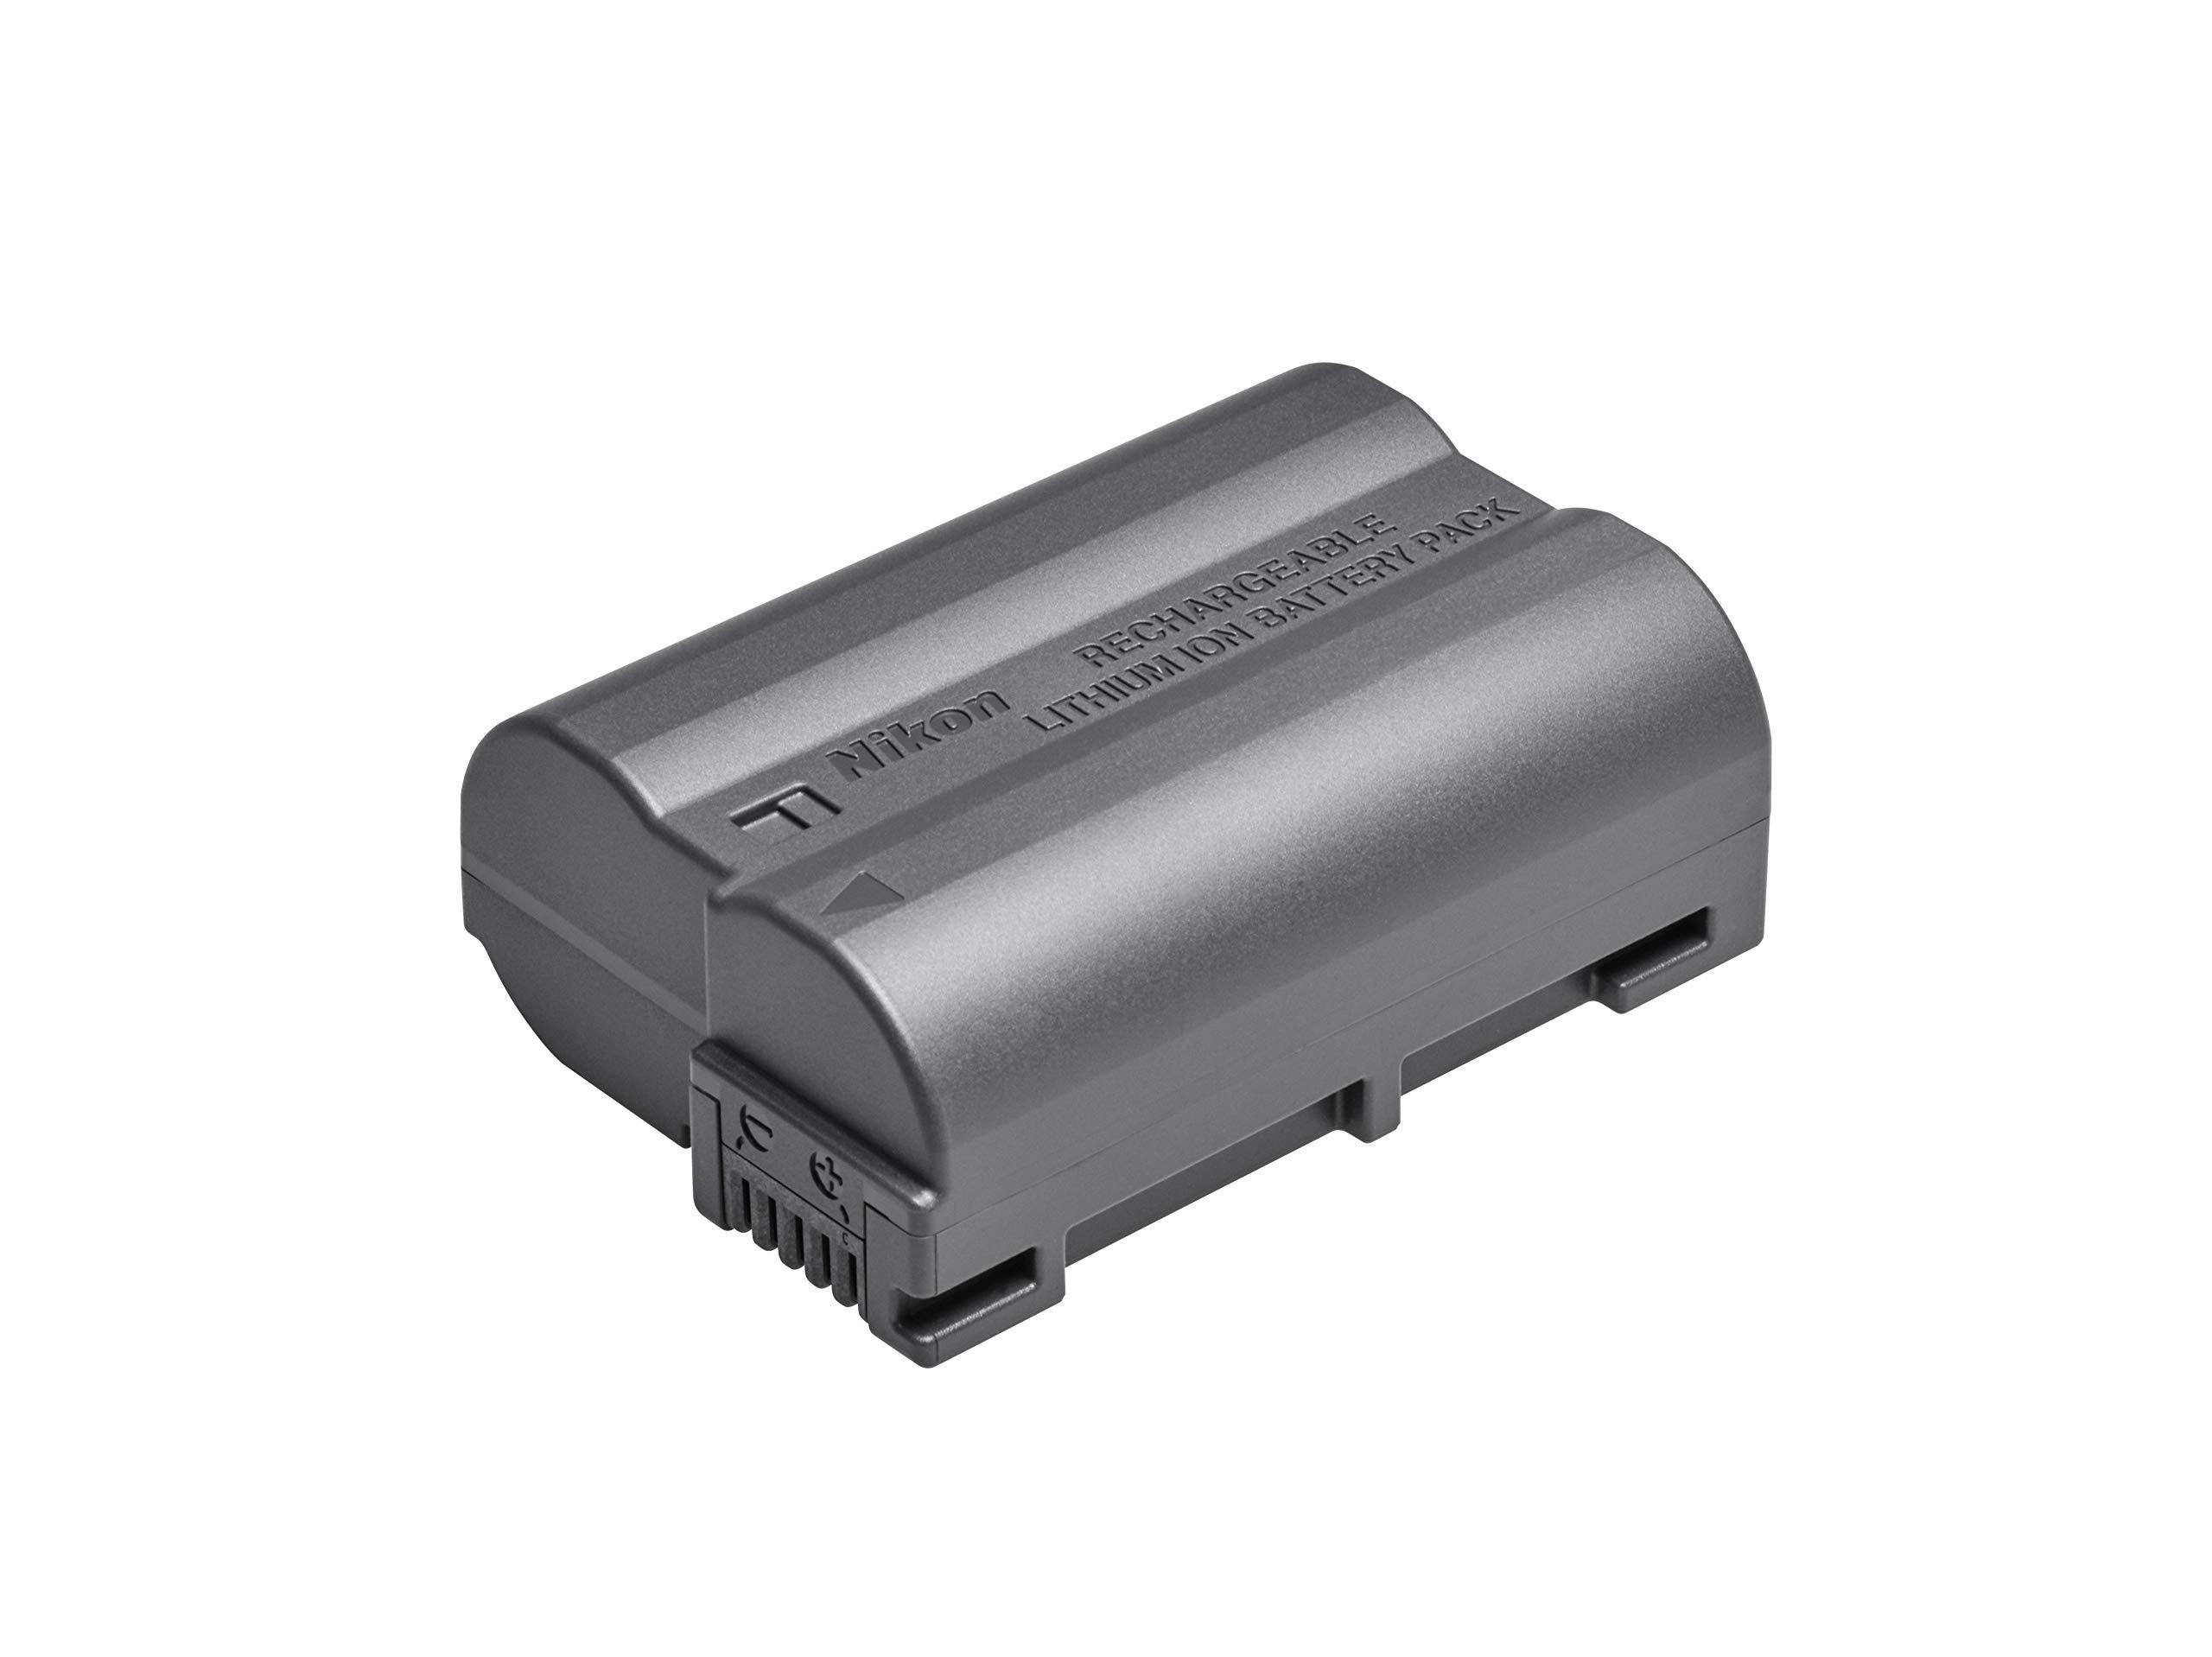 Nikon EN-EL15b Rechargeable Li-ion Battery by Nikon